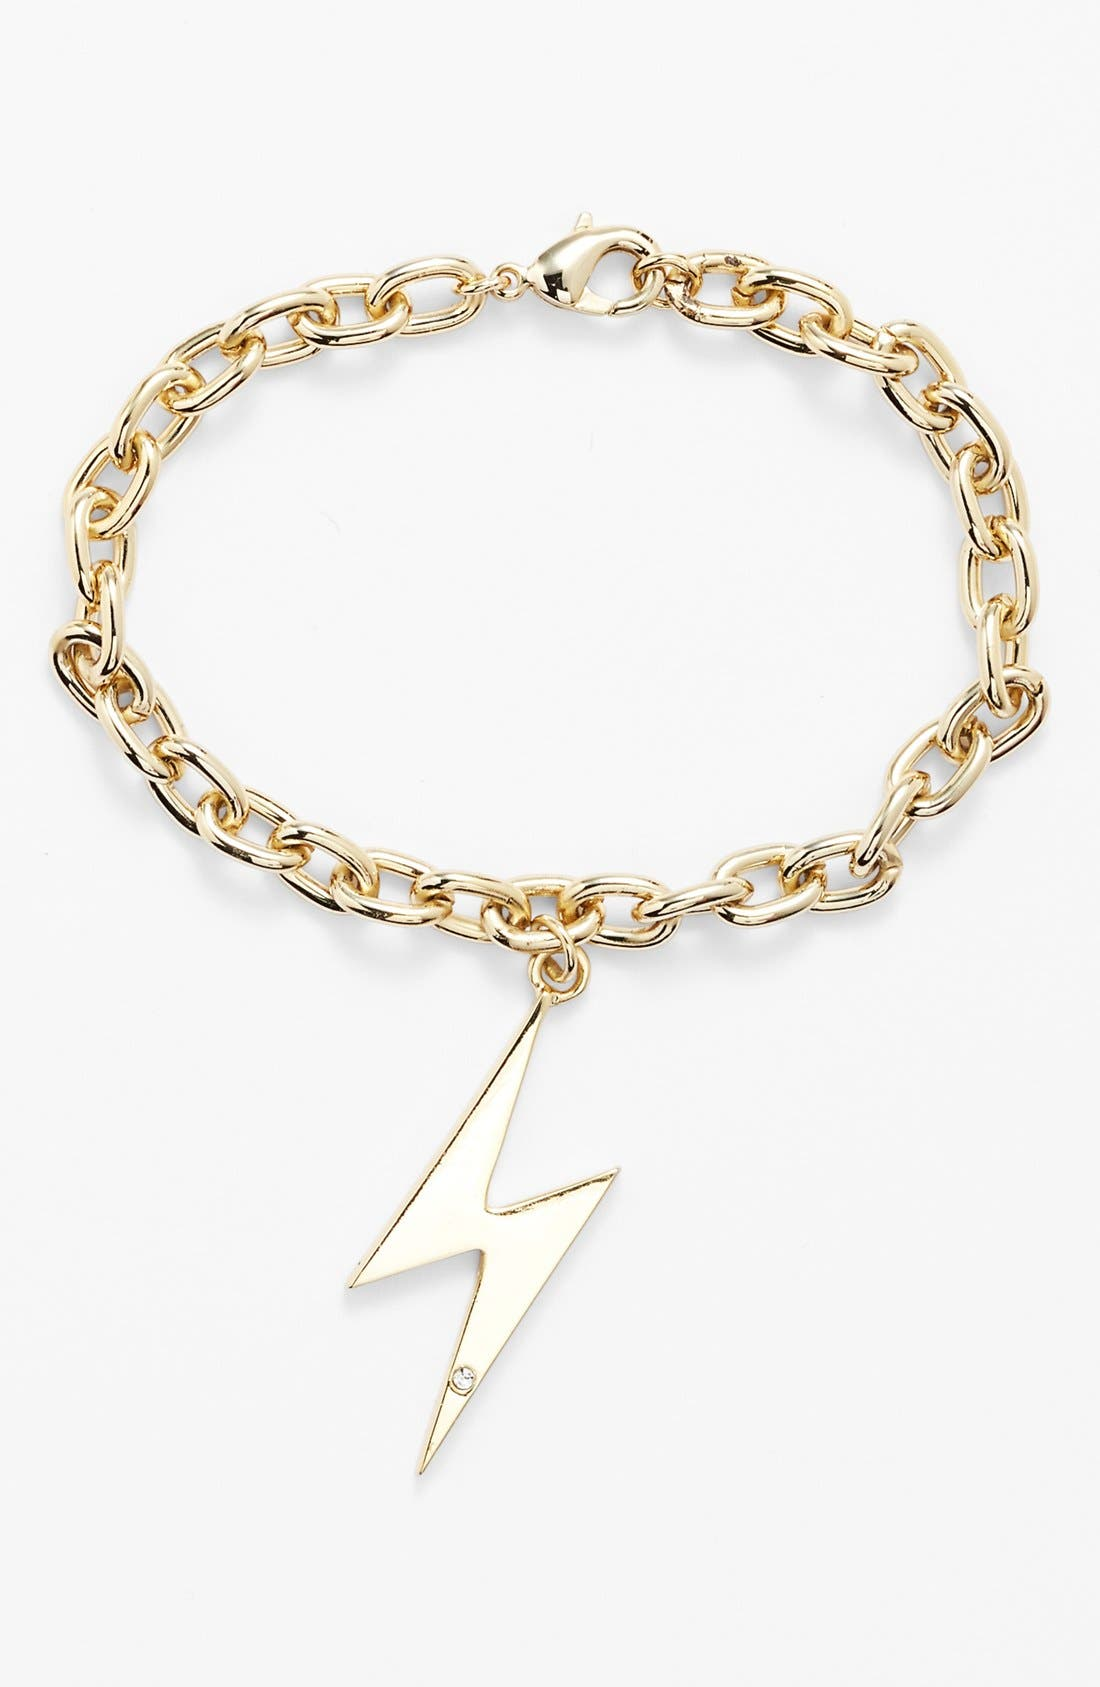 Main Image - Ariella Collection Lightning Bolt Charm Bracelet